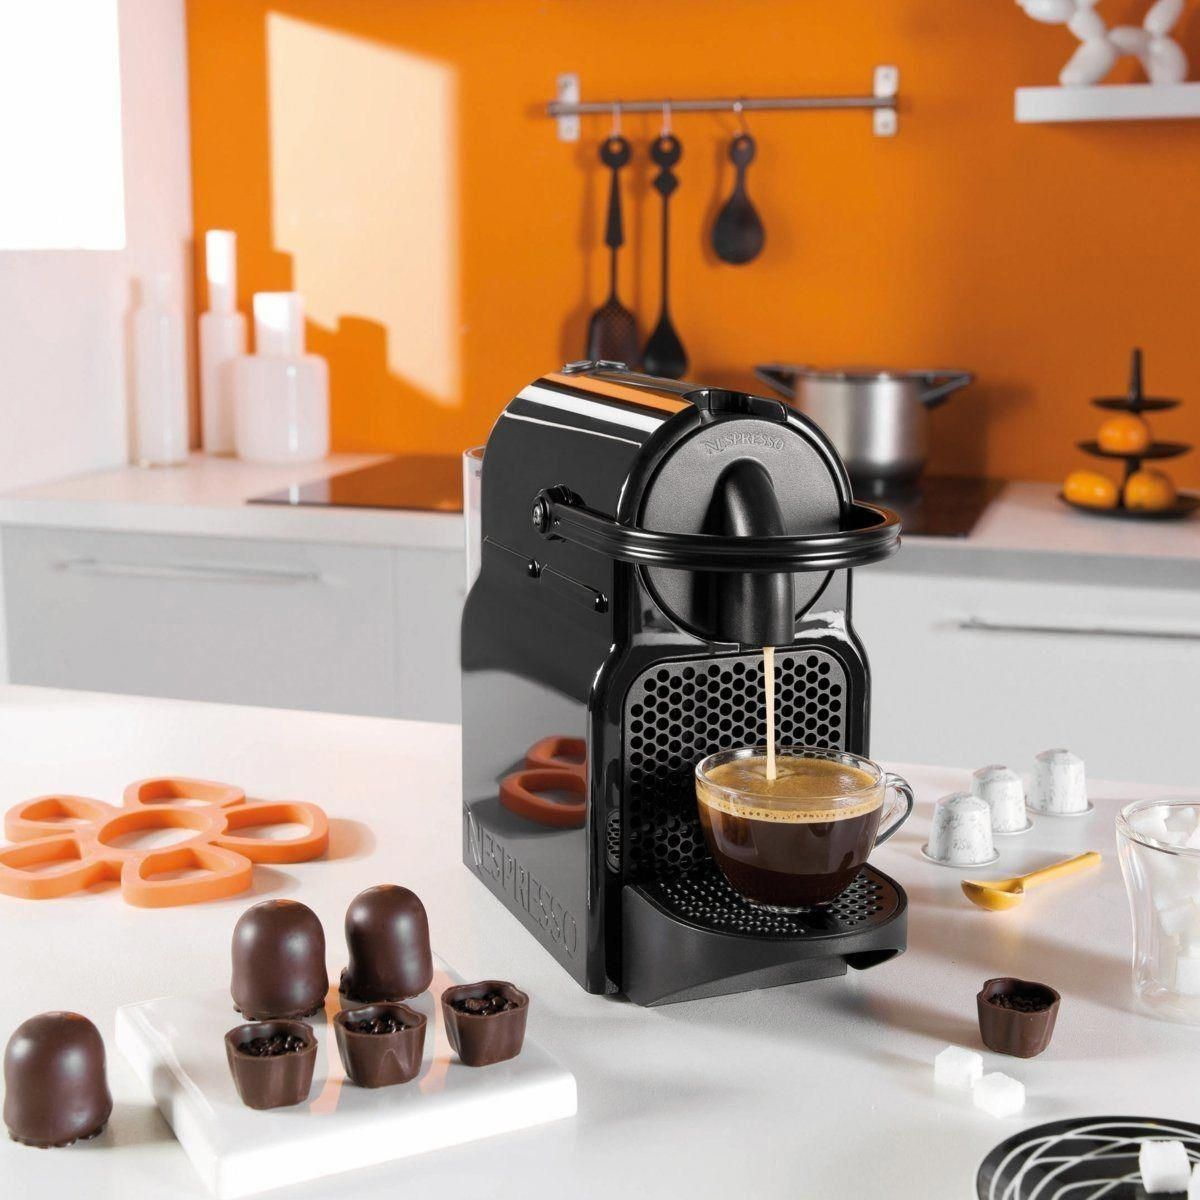 Machine À Café Nespresso Inissia M105 11350 Taille